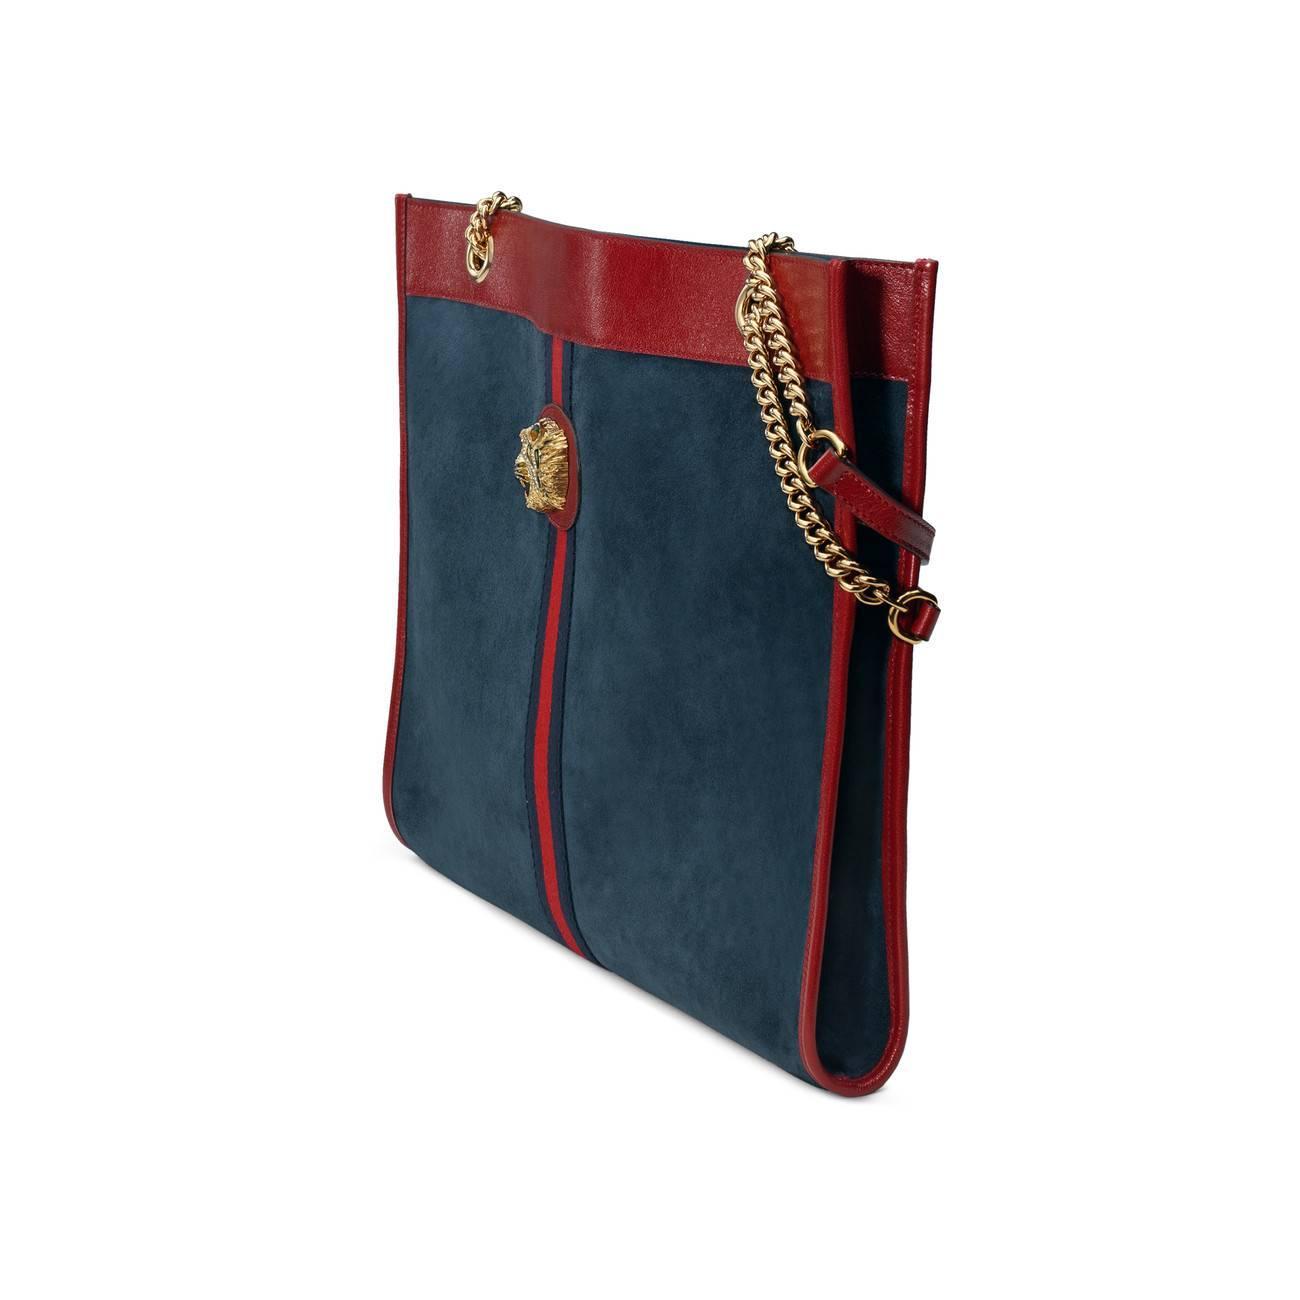 d4d43e25118 Gucci - Blue Rajah Large Tote - Lyst. View fullscreen